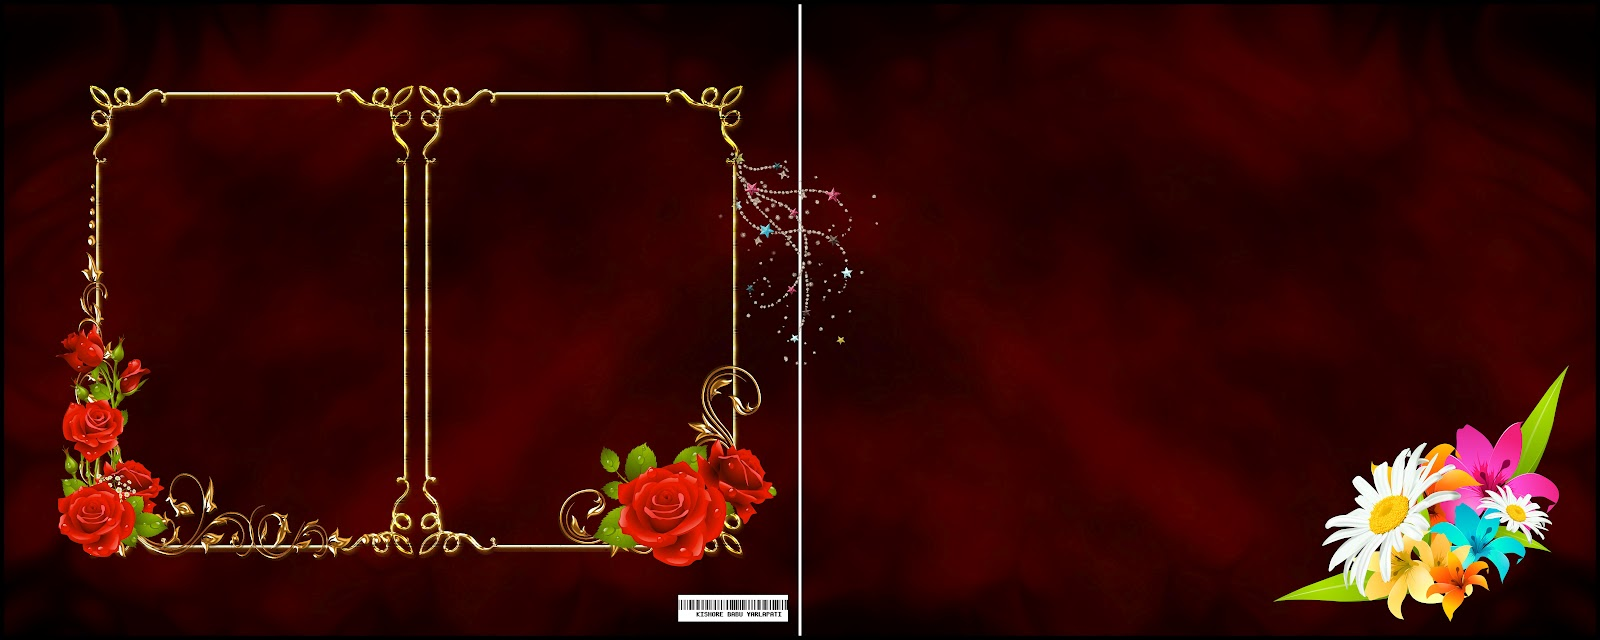 5 12X30 Album Karizma PSD Free Download Images